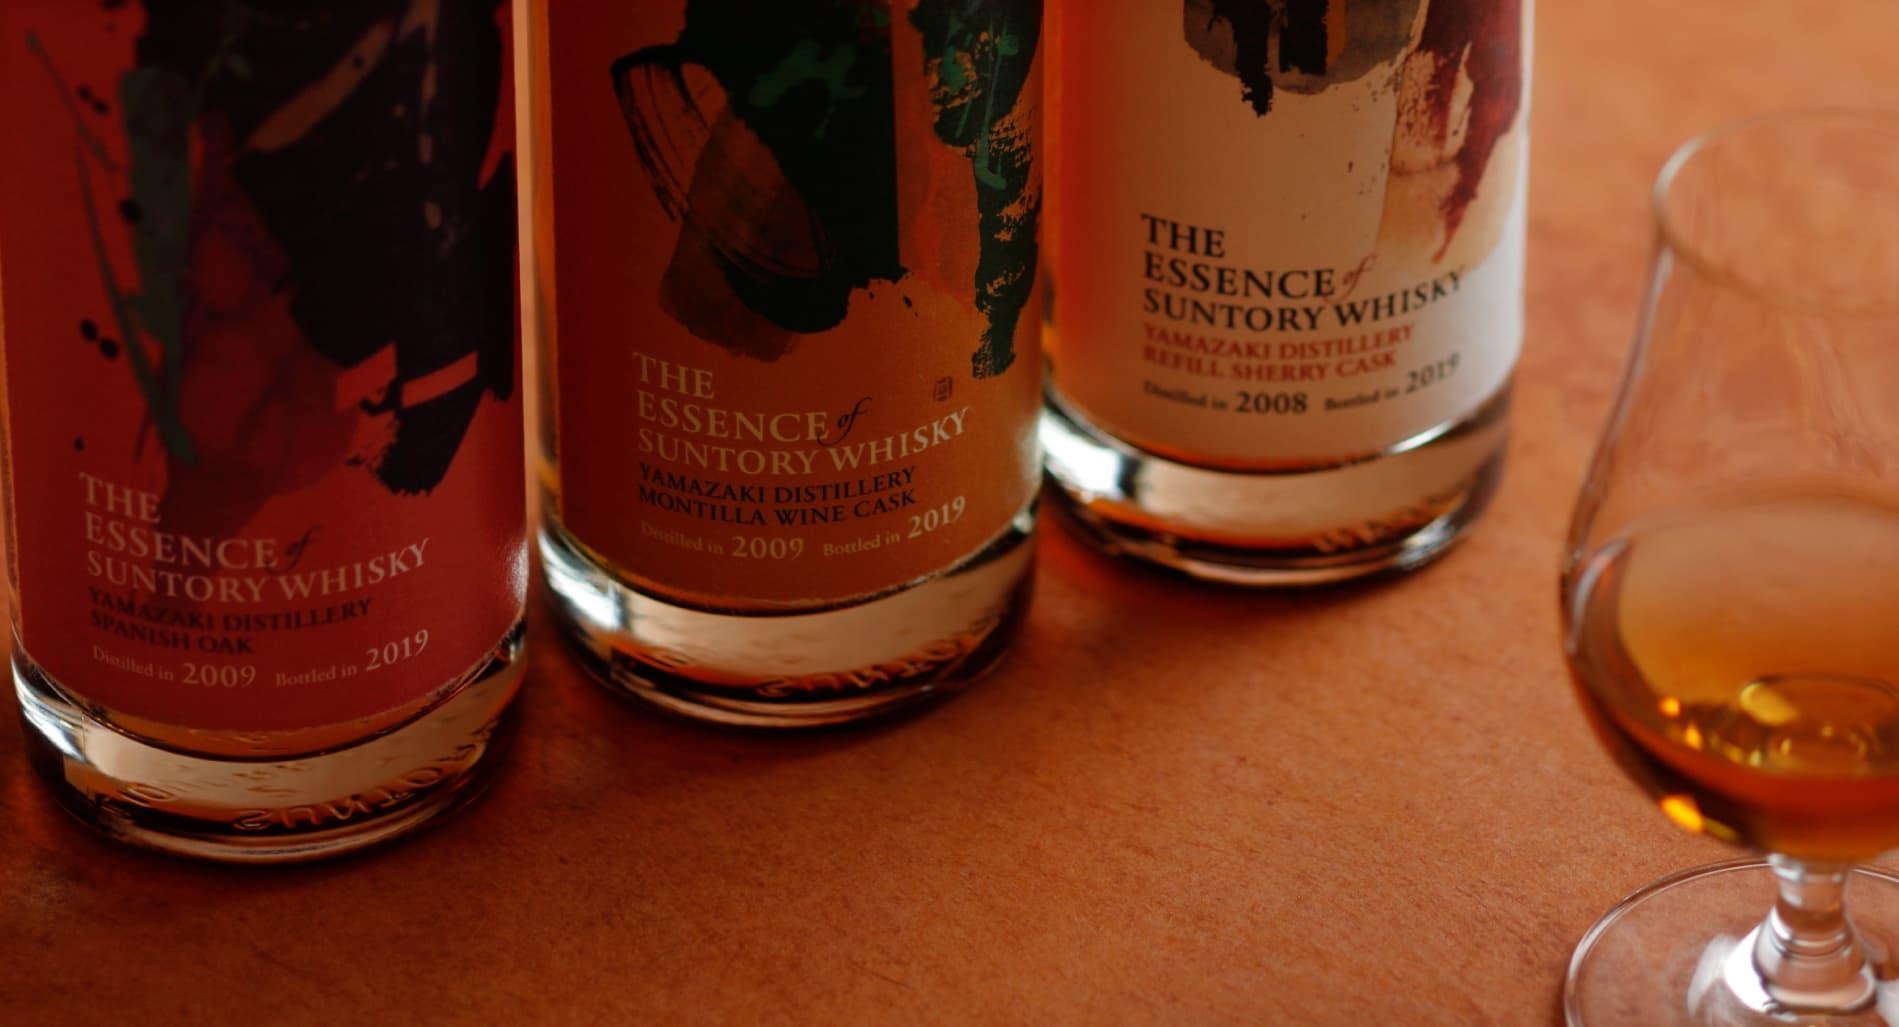 The Essence of Suntory Whisky Volume 2: Yamazaki loves Spain